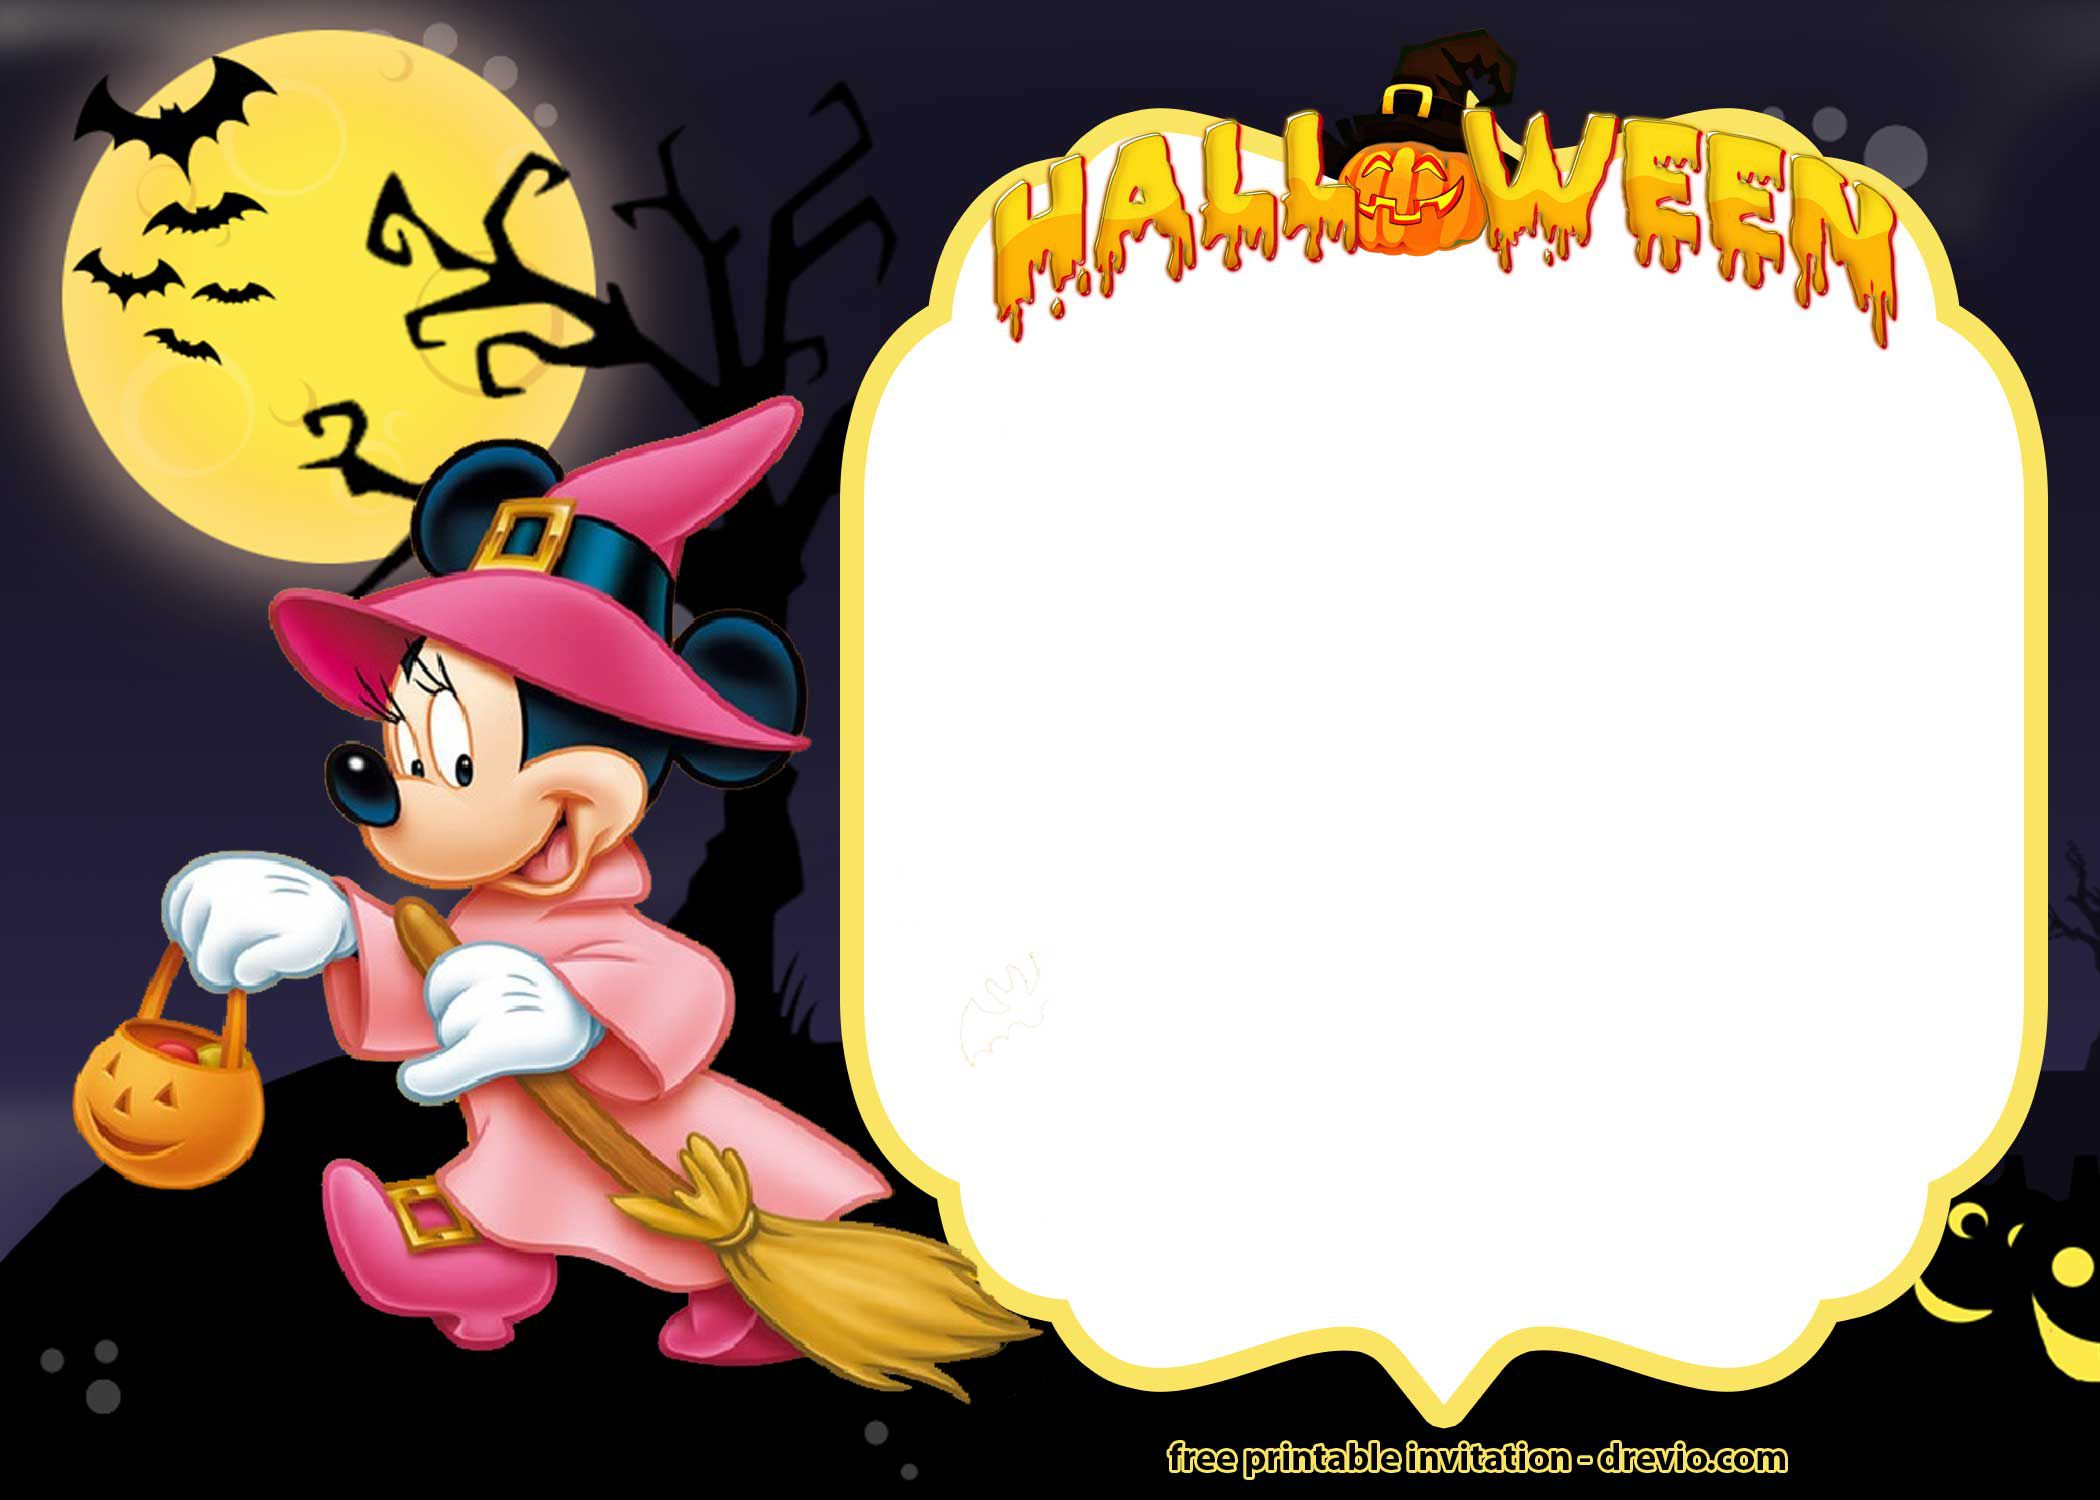 009 Excellent Free Halloween Invitation Template Idea  Templates Online Printable Birthday Party WeddingFull